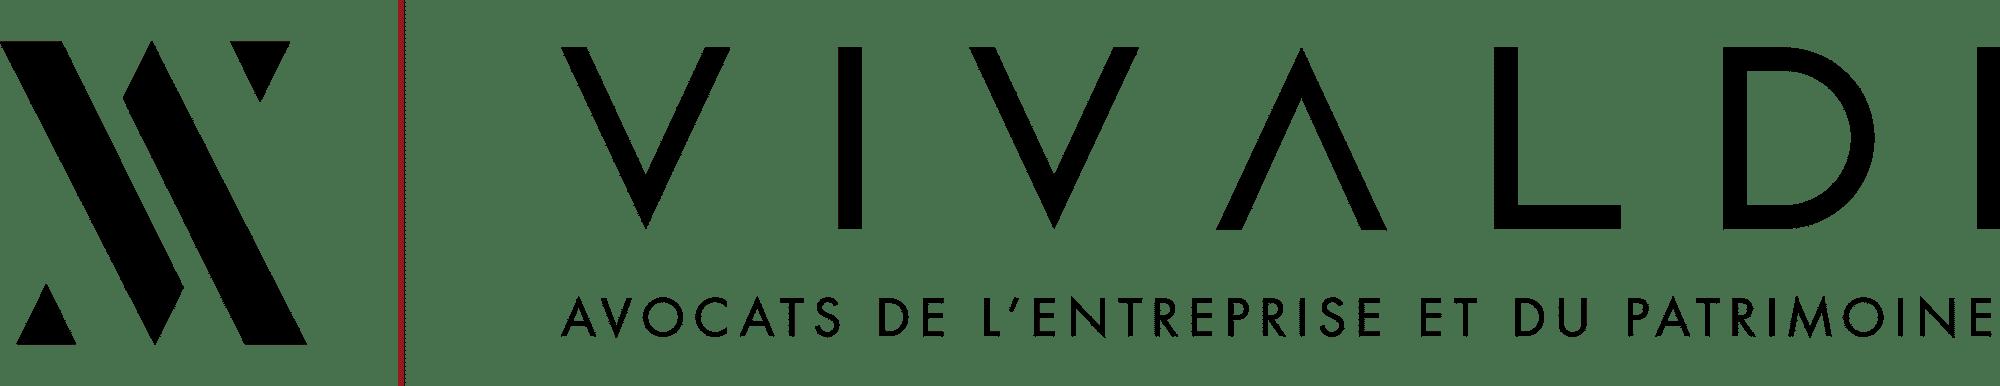 Vivaldi Avocats